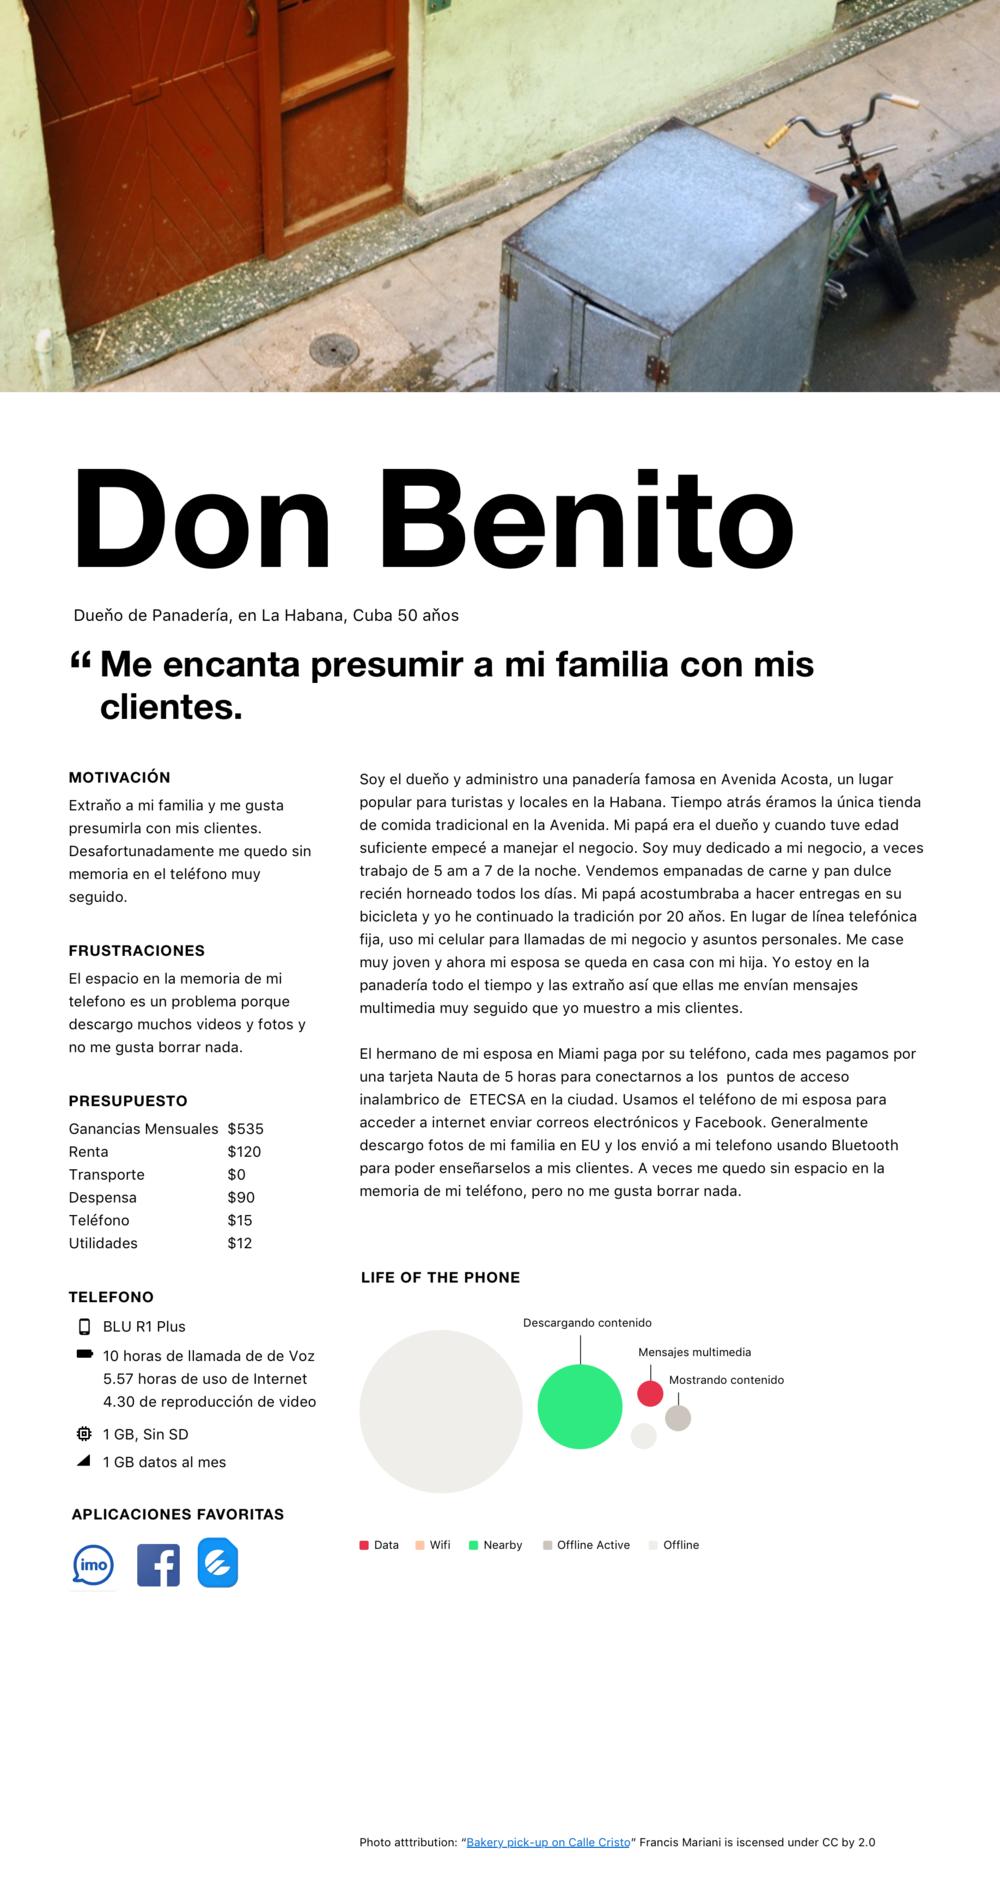 ux-persona-cuba-Don Benito@3x.png